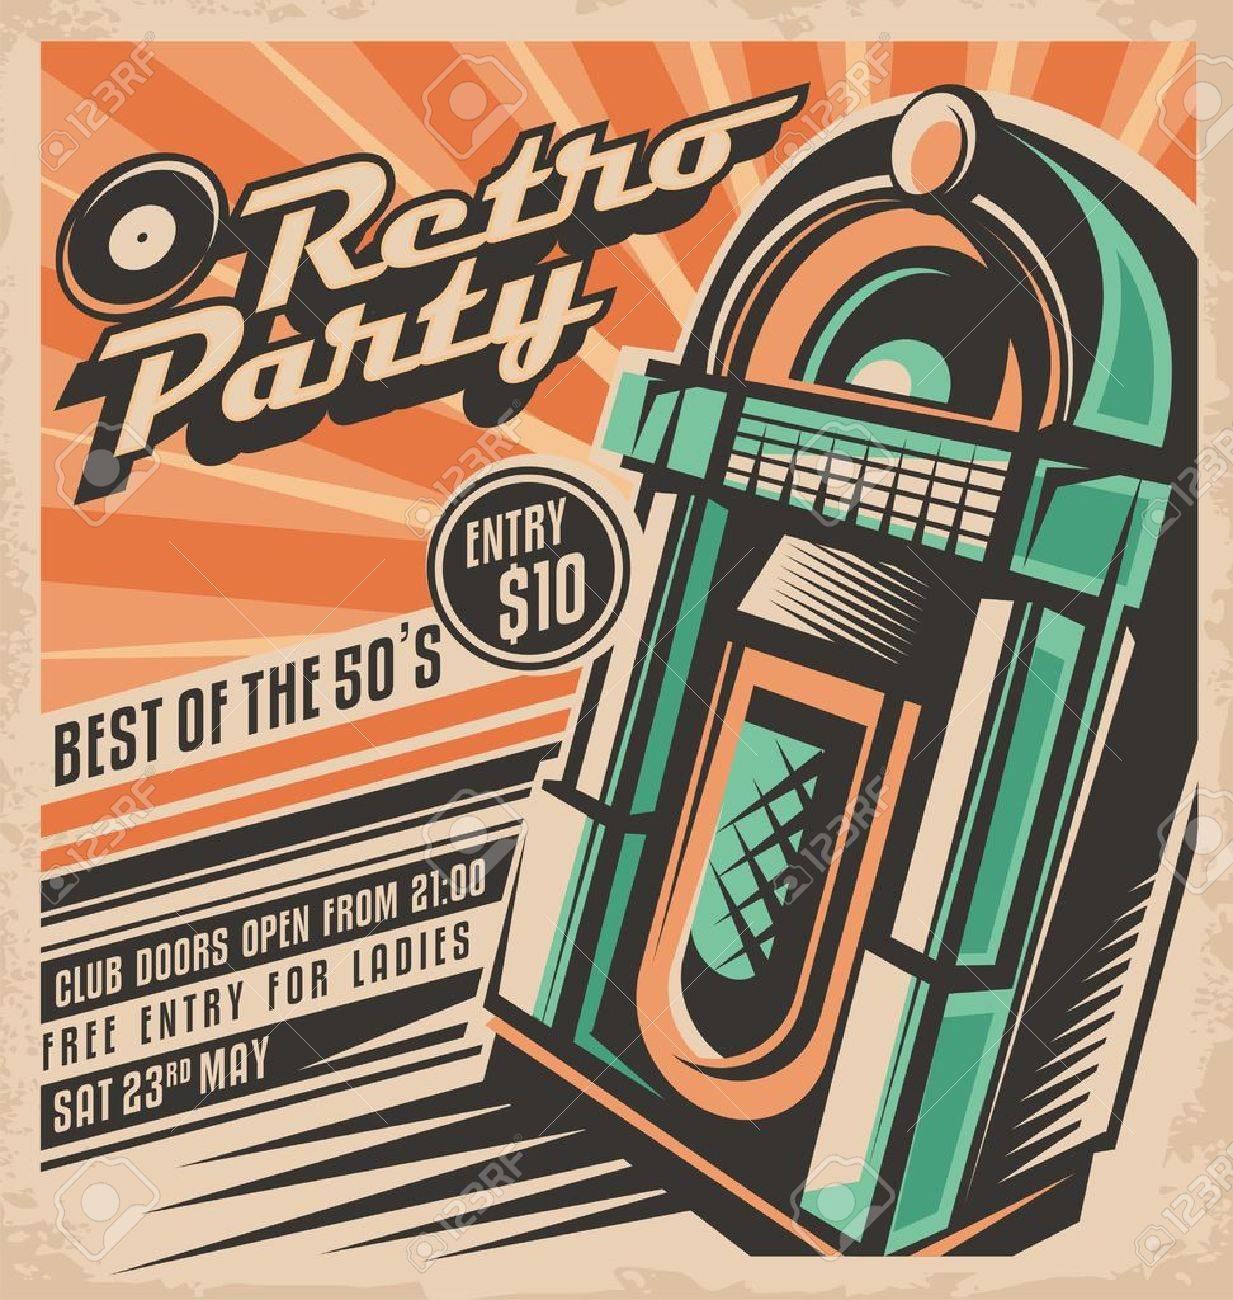 Retro Party Invitation Design Royalty Free Cliparts, Vectors, And ...